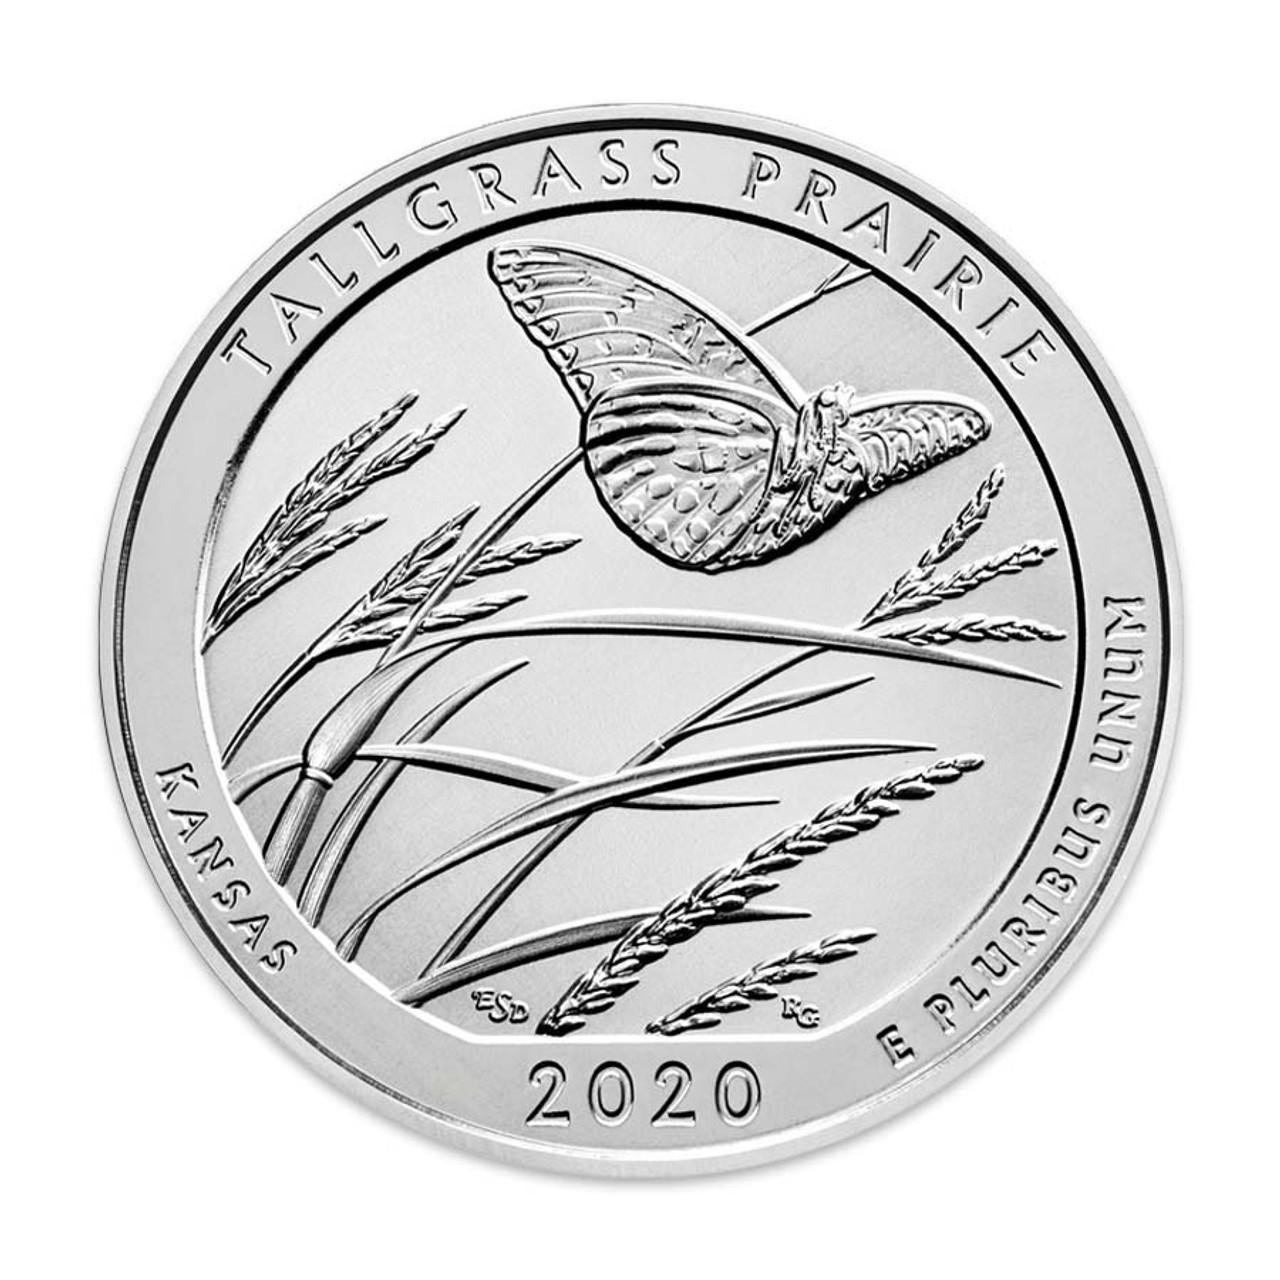 2020-D Tallgrass Prairie National Preserve Quarter Brilliant Uncirculated